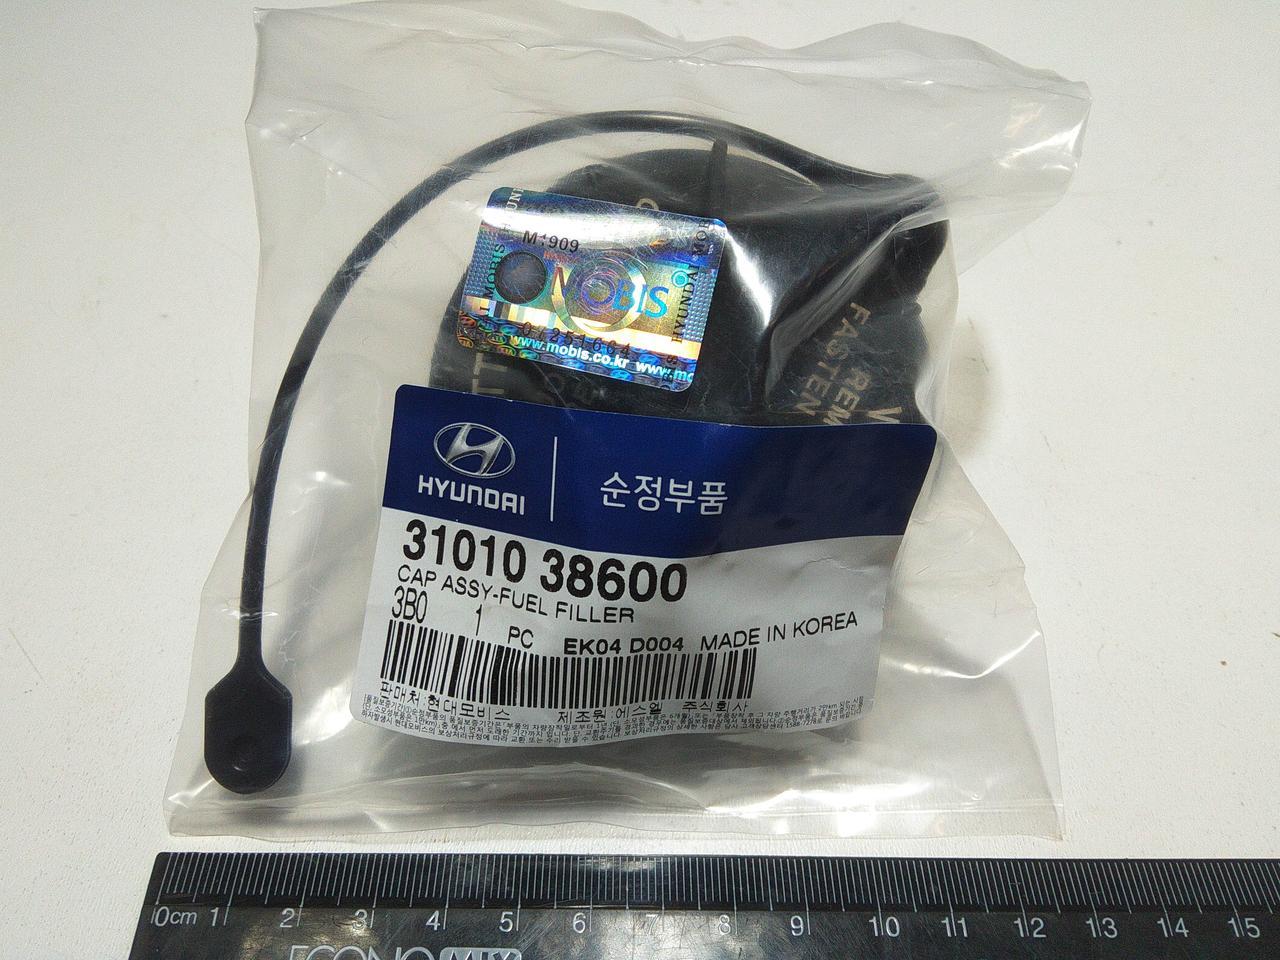 Крышка бензобака Hyundai/KIA, MOBIS (3101038600)